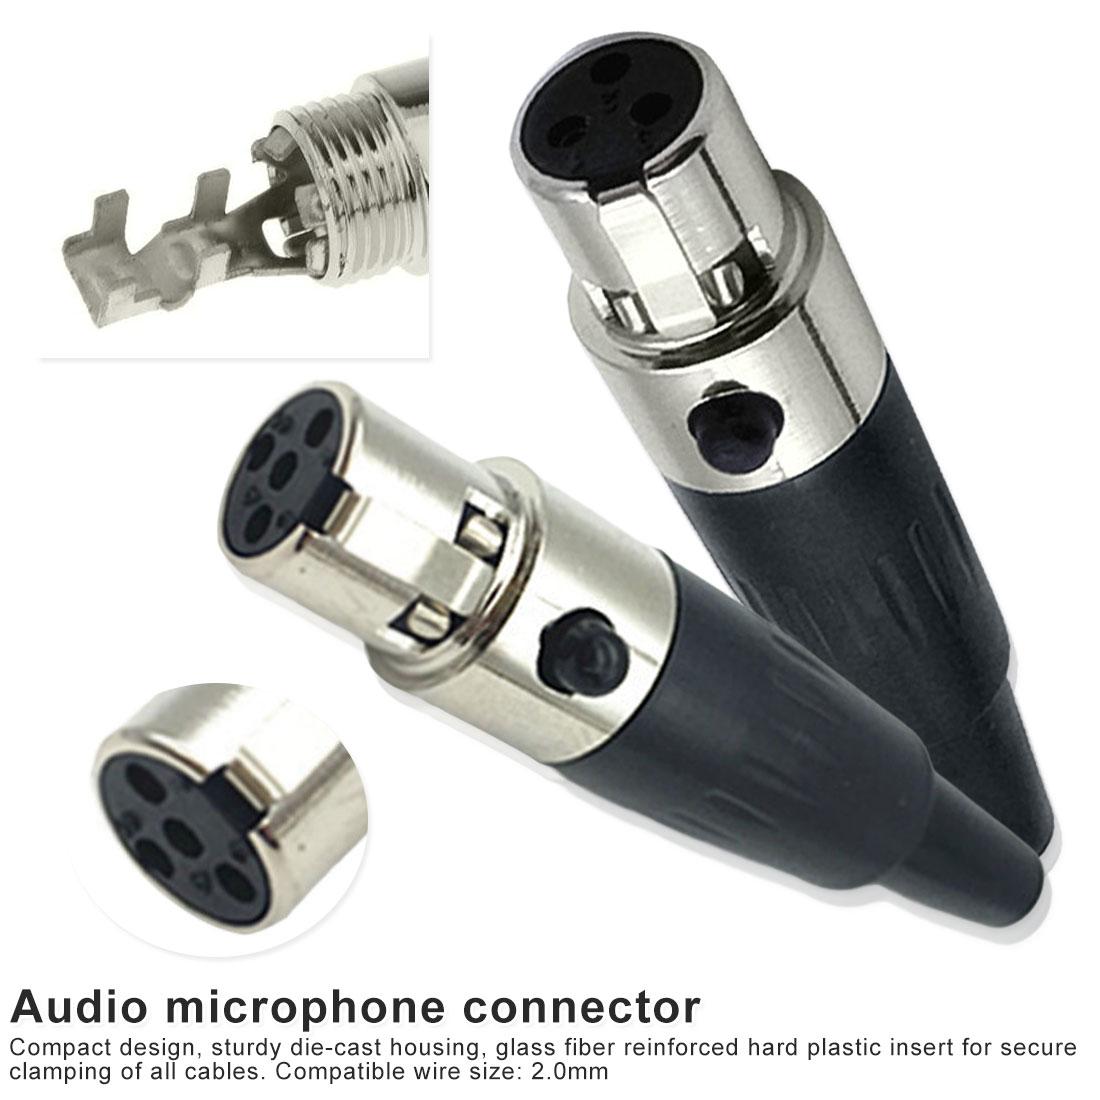 Micrófono-enchufe 4 pin para soldar a cables del micrófono